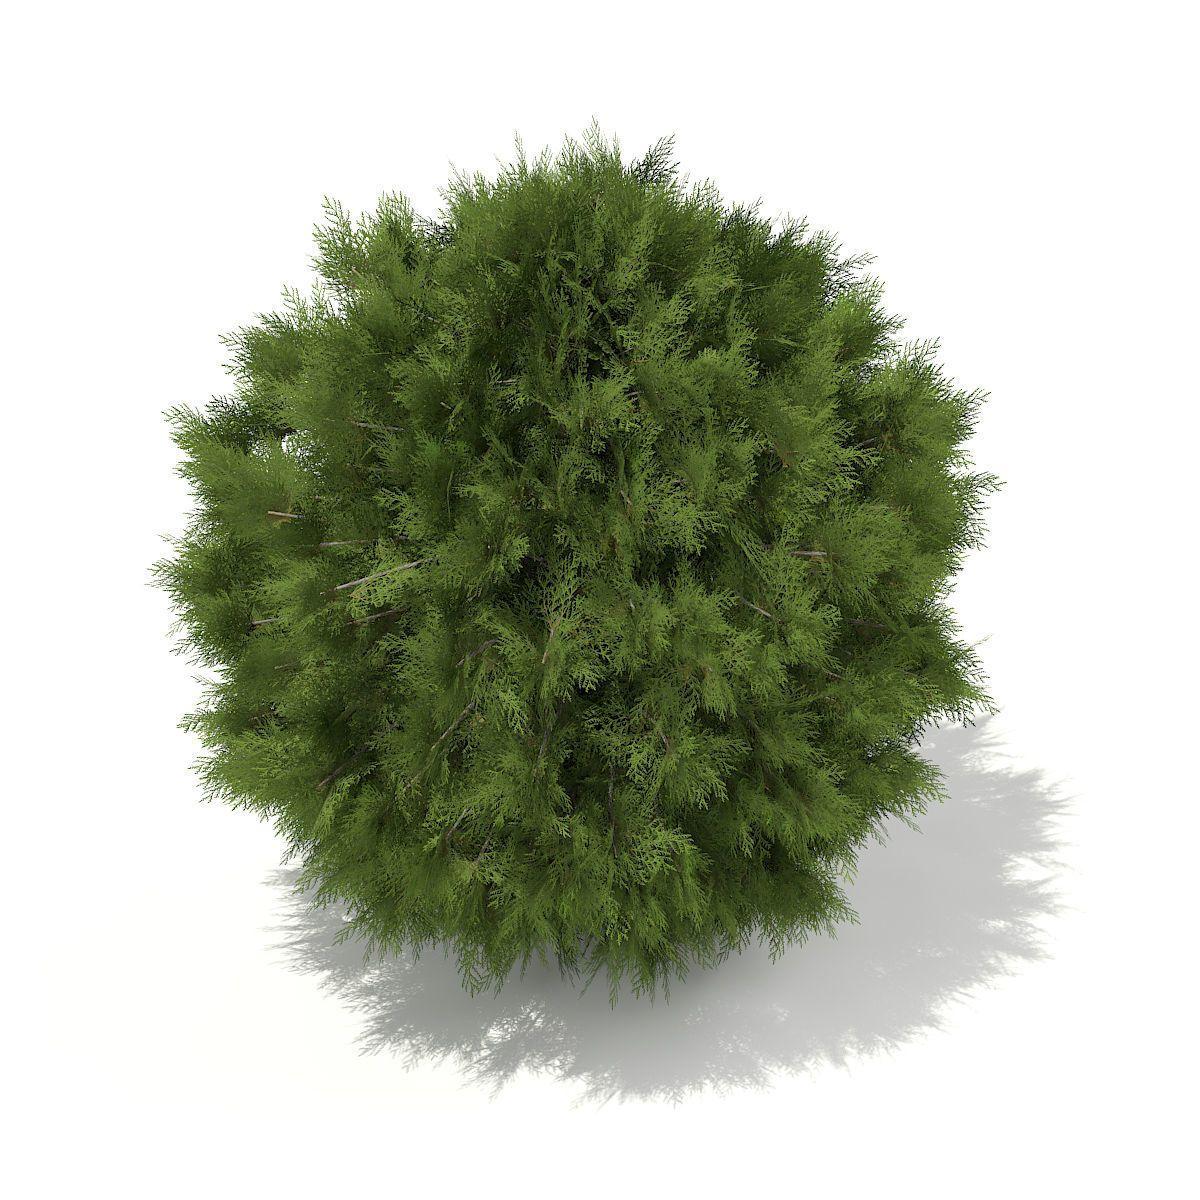 White Cedar Thuja Occidentalis 1m 3d Model Trees Top View Tree Photoshop Tree Plan